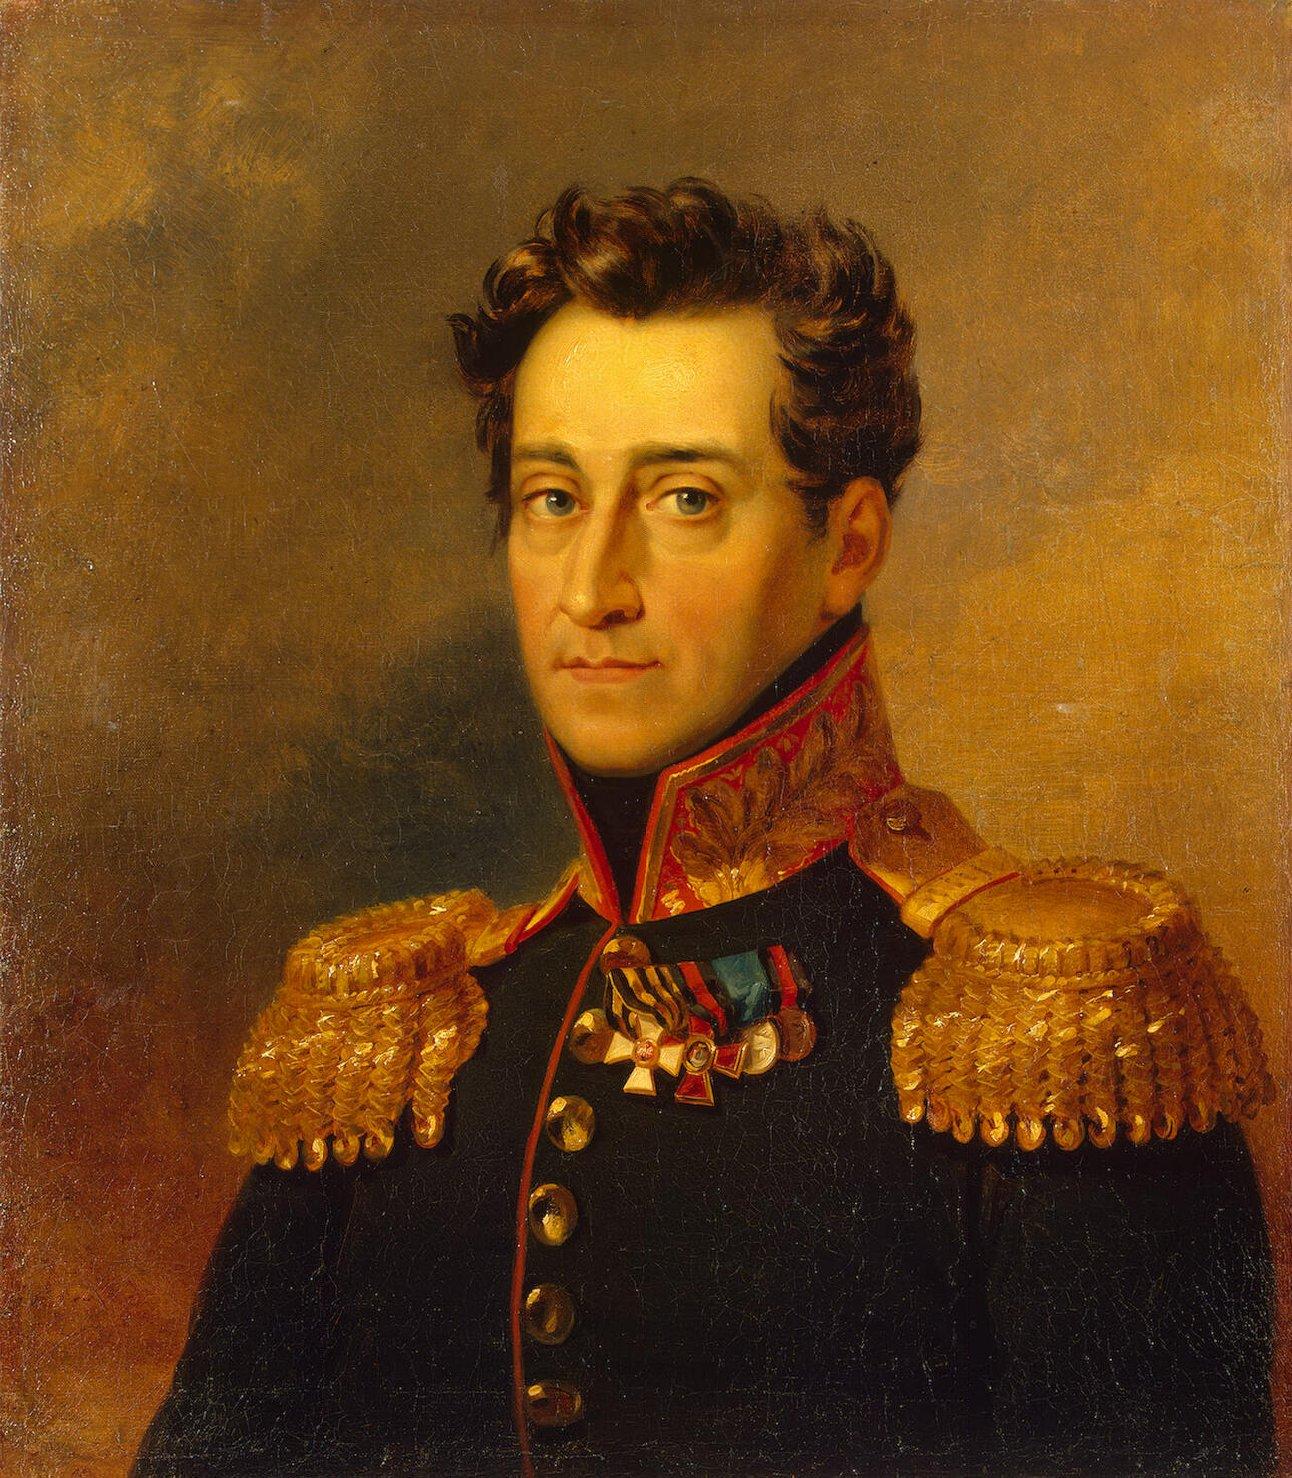 Гудович, Андрей Иванович